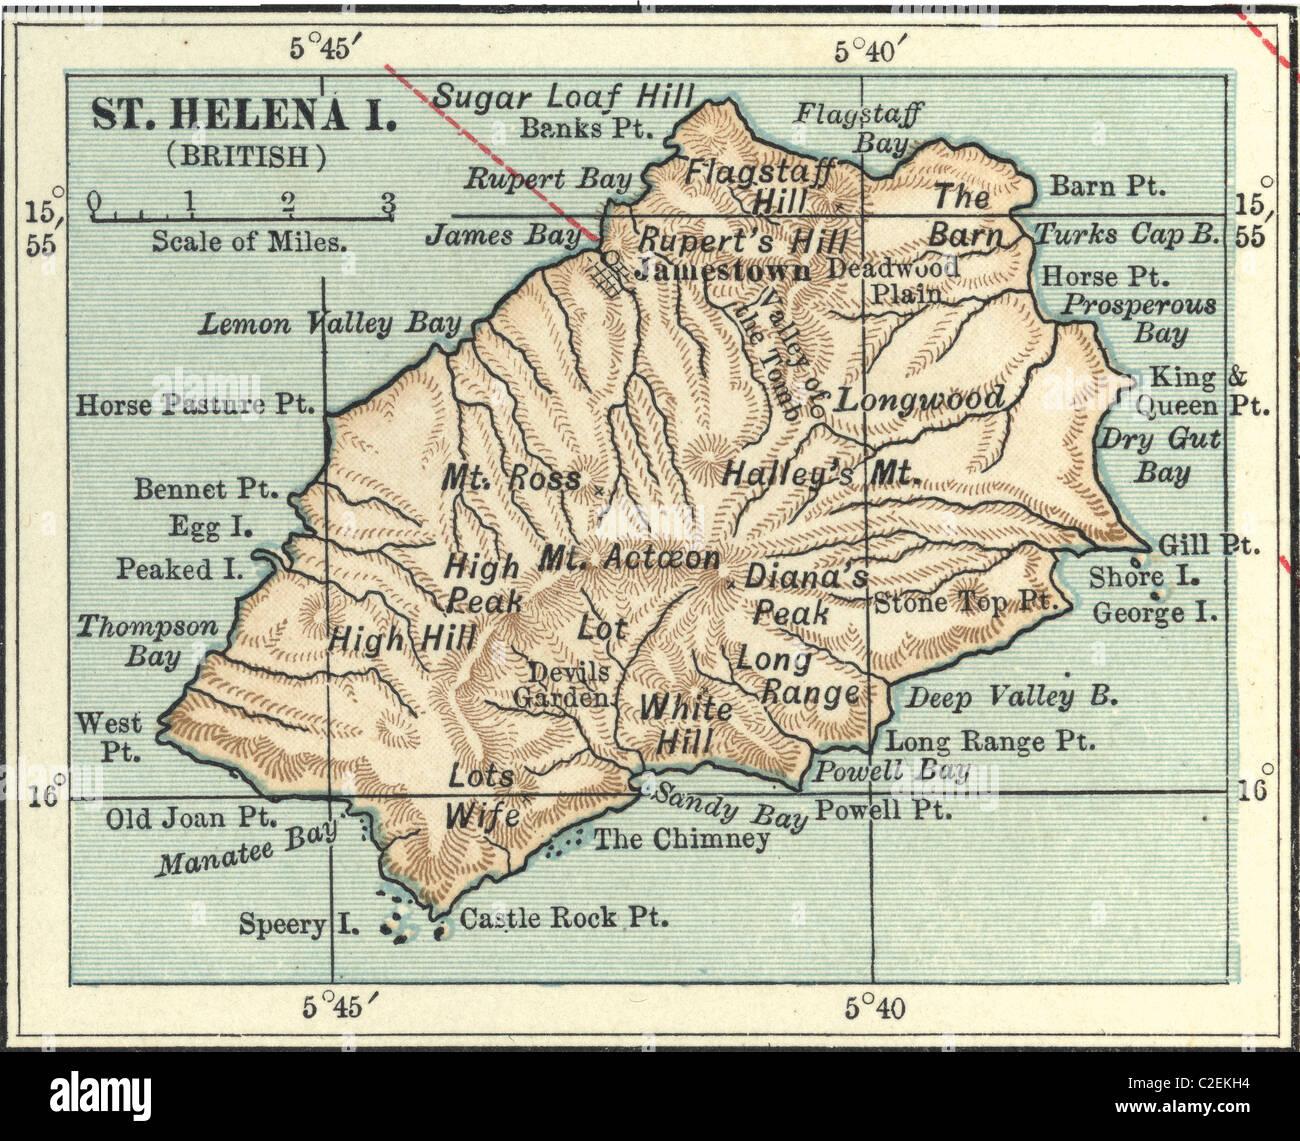 Map of Saint Helena Island Stock Photo Royalty Free Image 35972752